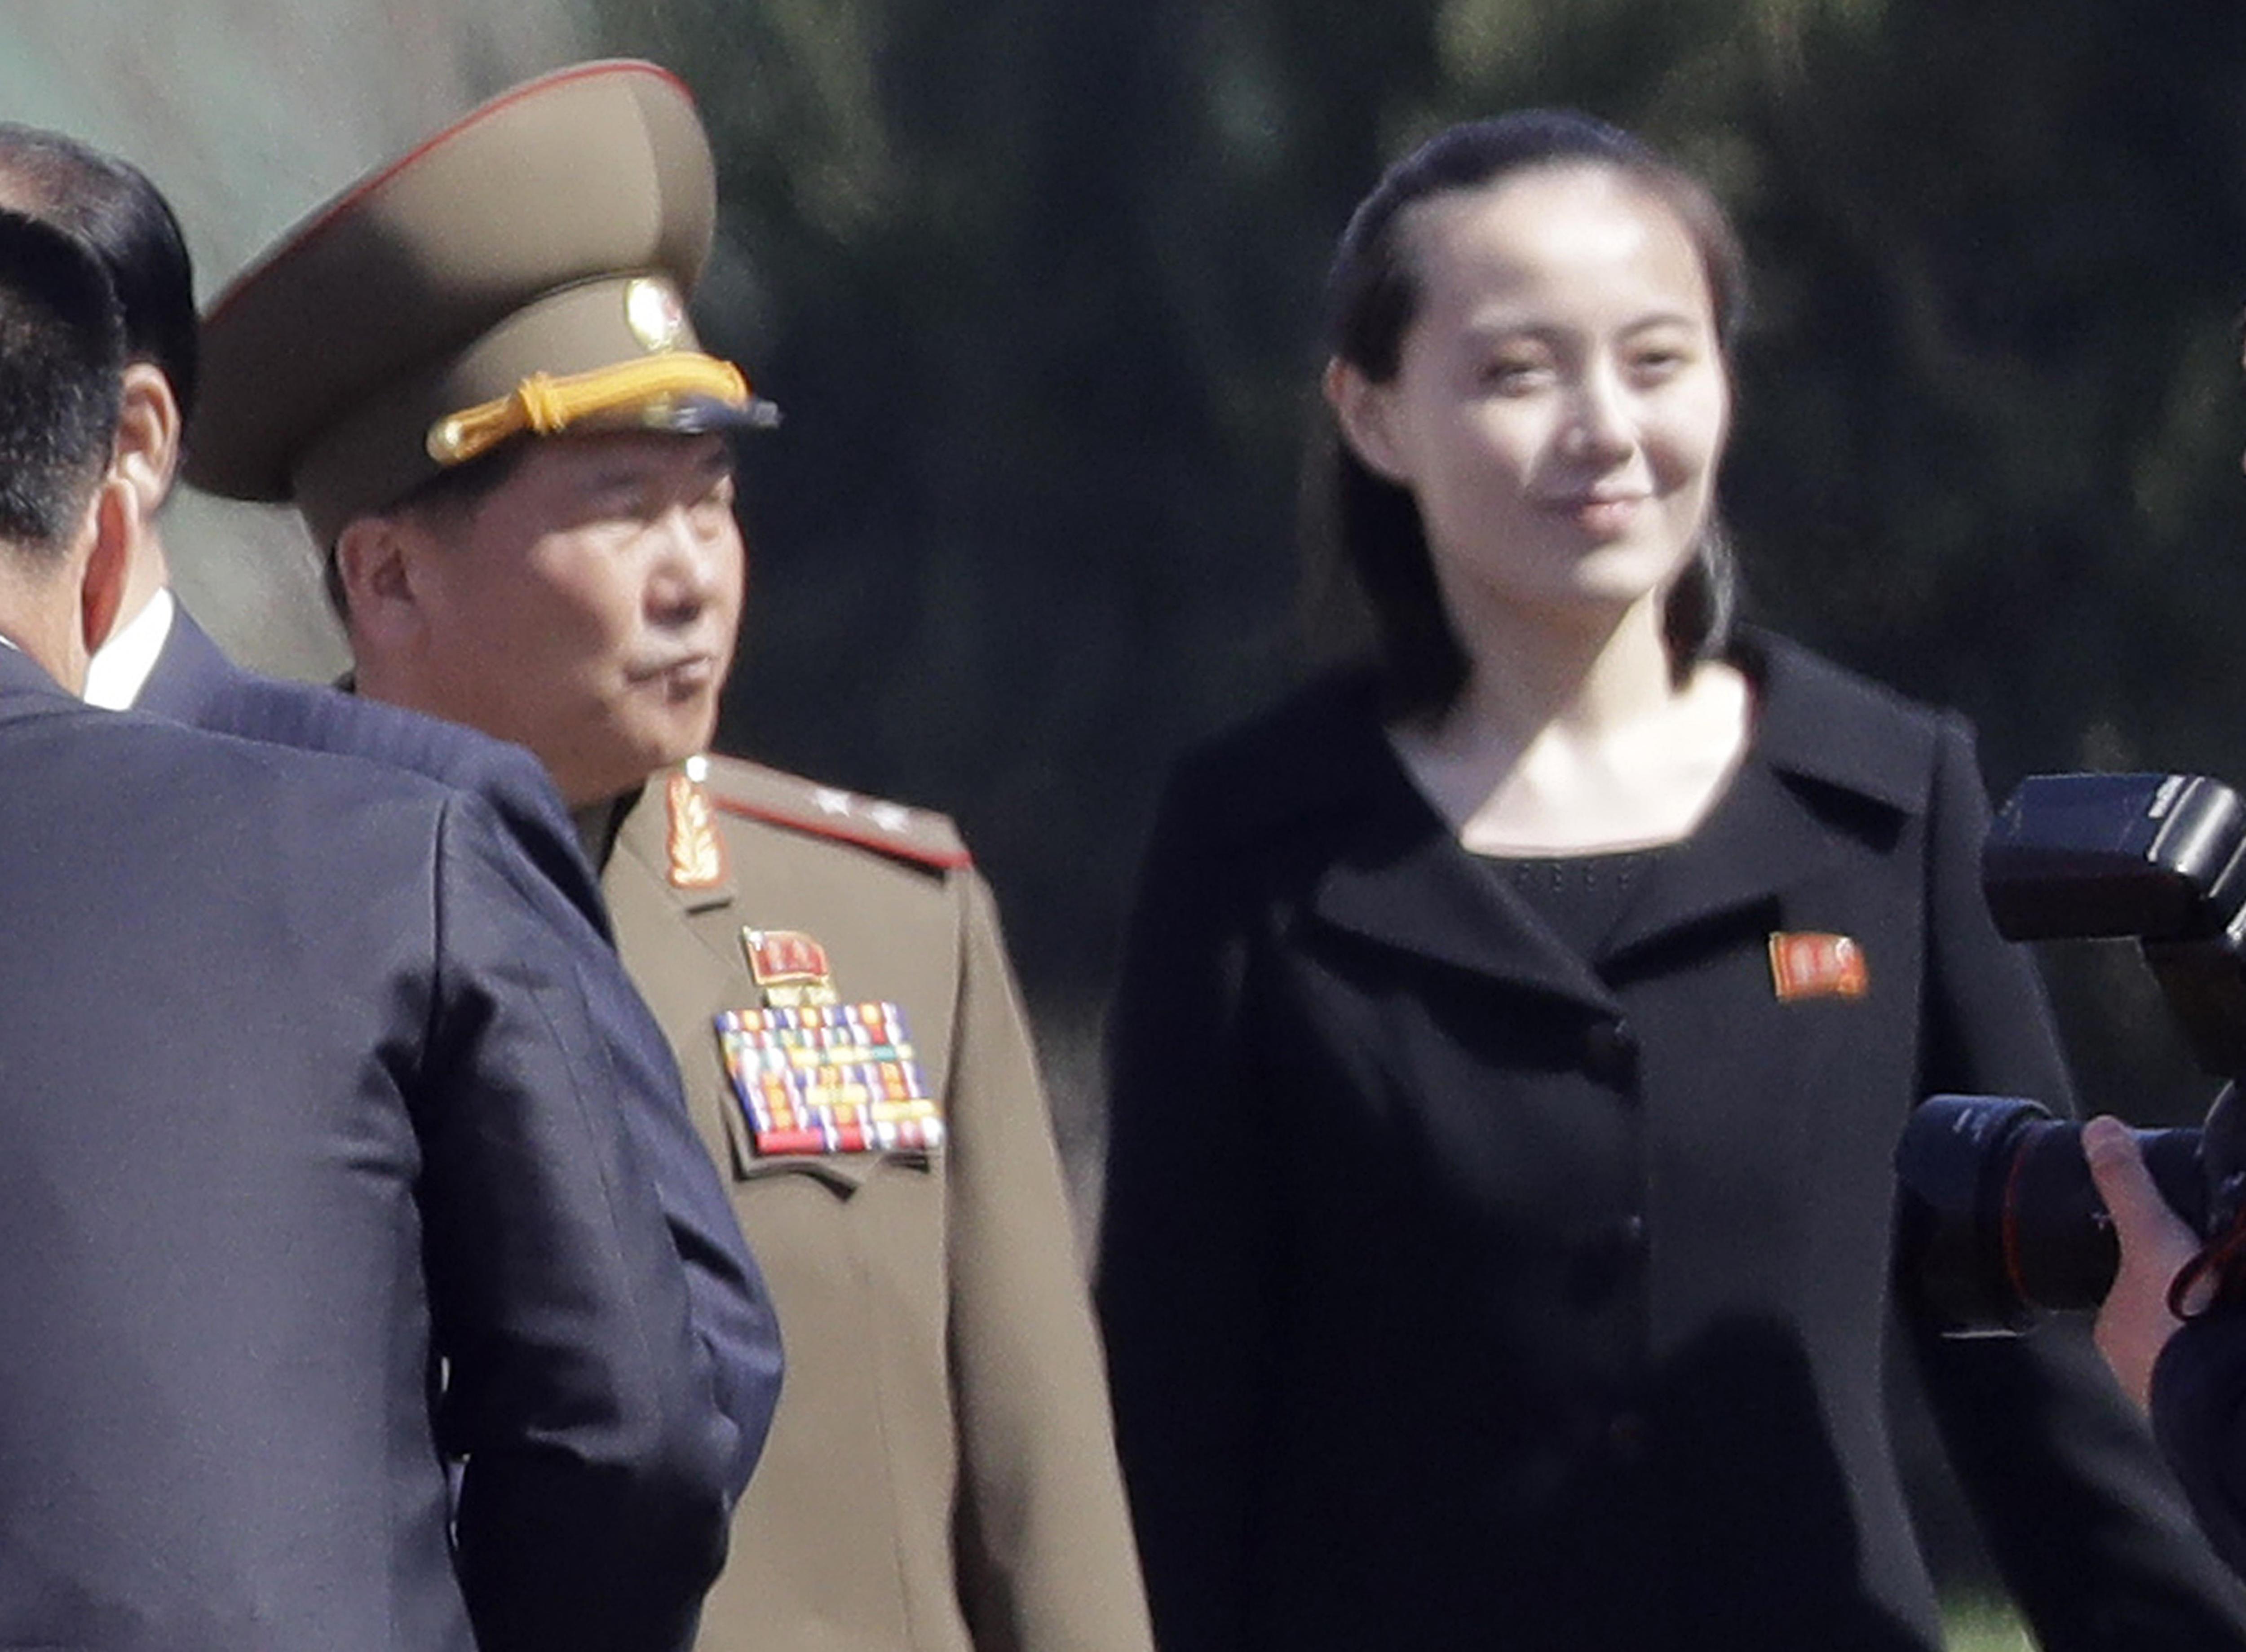 Kim Jong Un Sends Sister Kim Yo Jong To Olympics In South Korea Amid North Korea Diplomacy Standoff With Donald Trump Cbs News